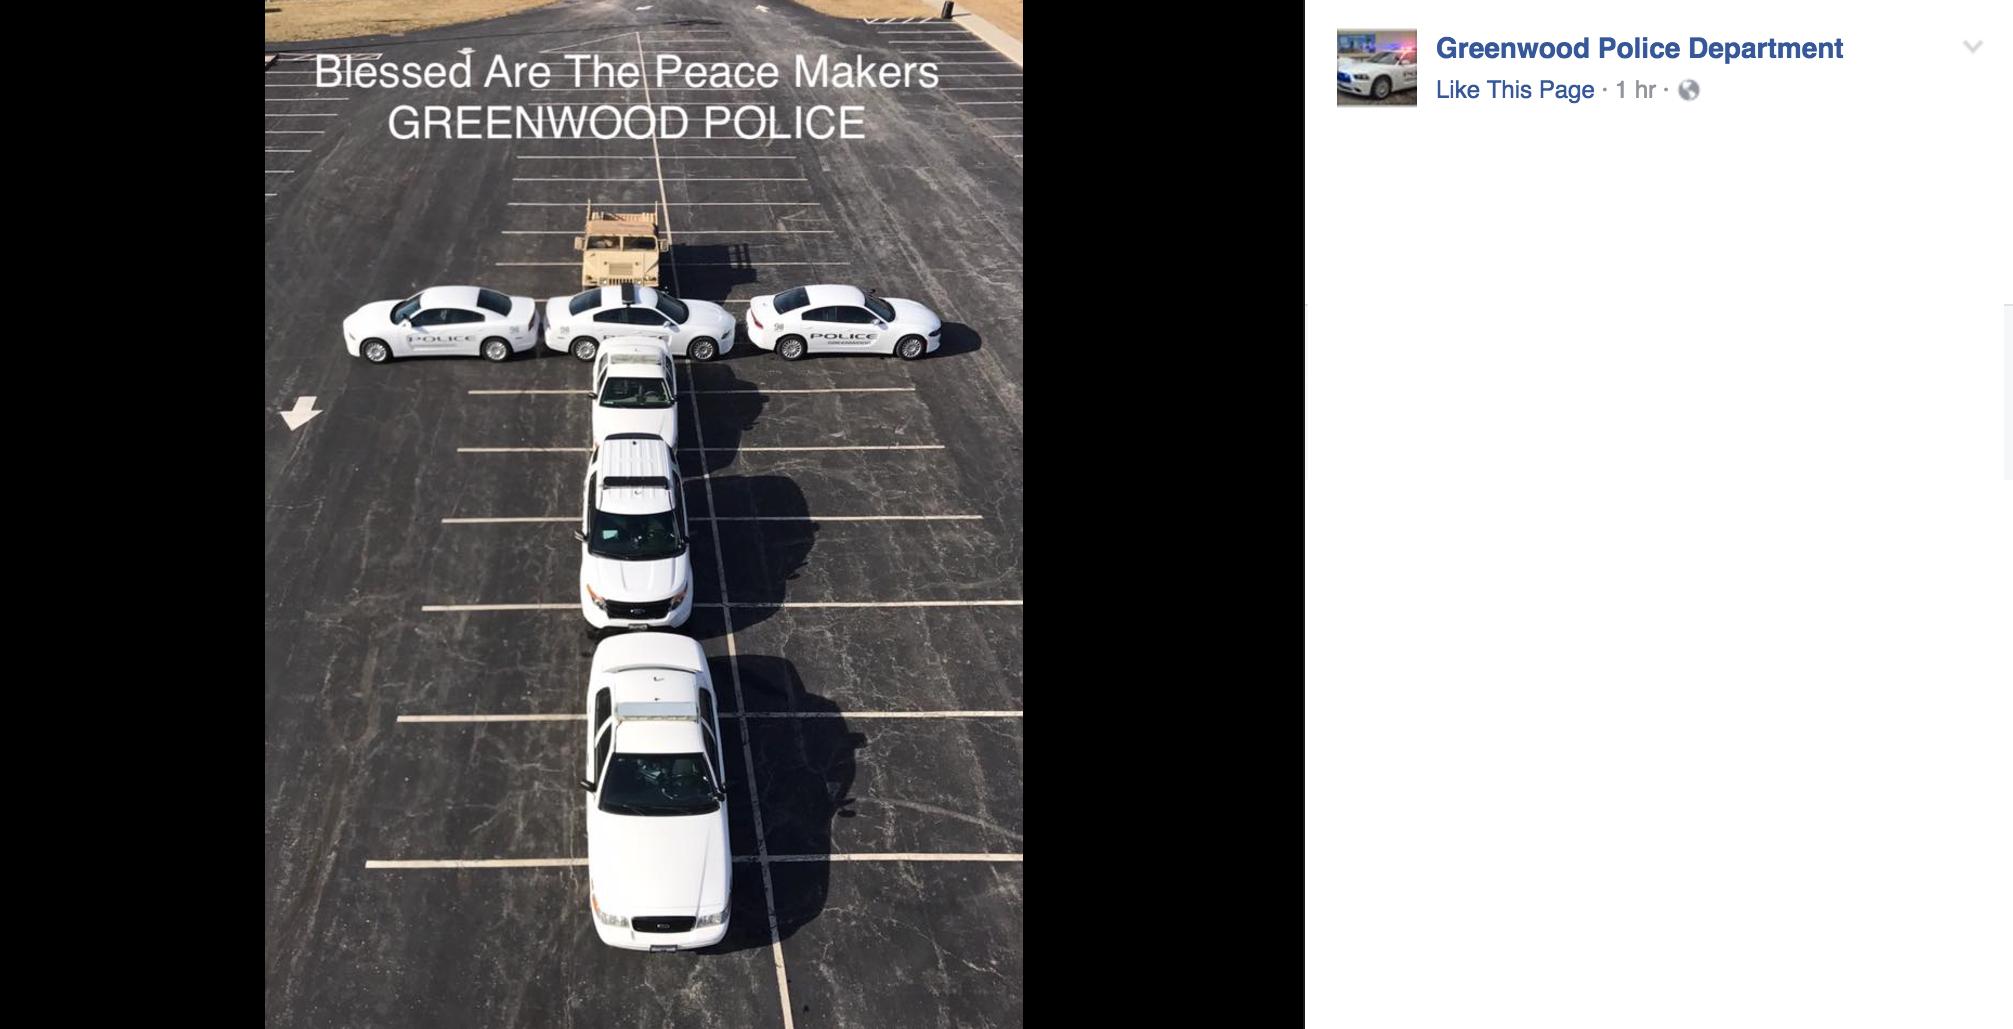 PeacemakersGreenwood1